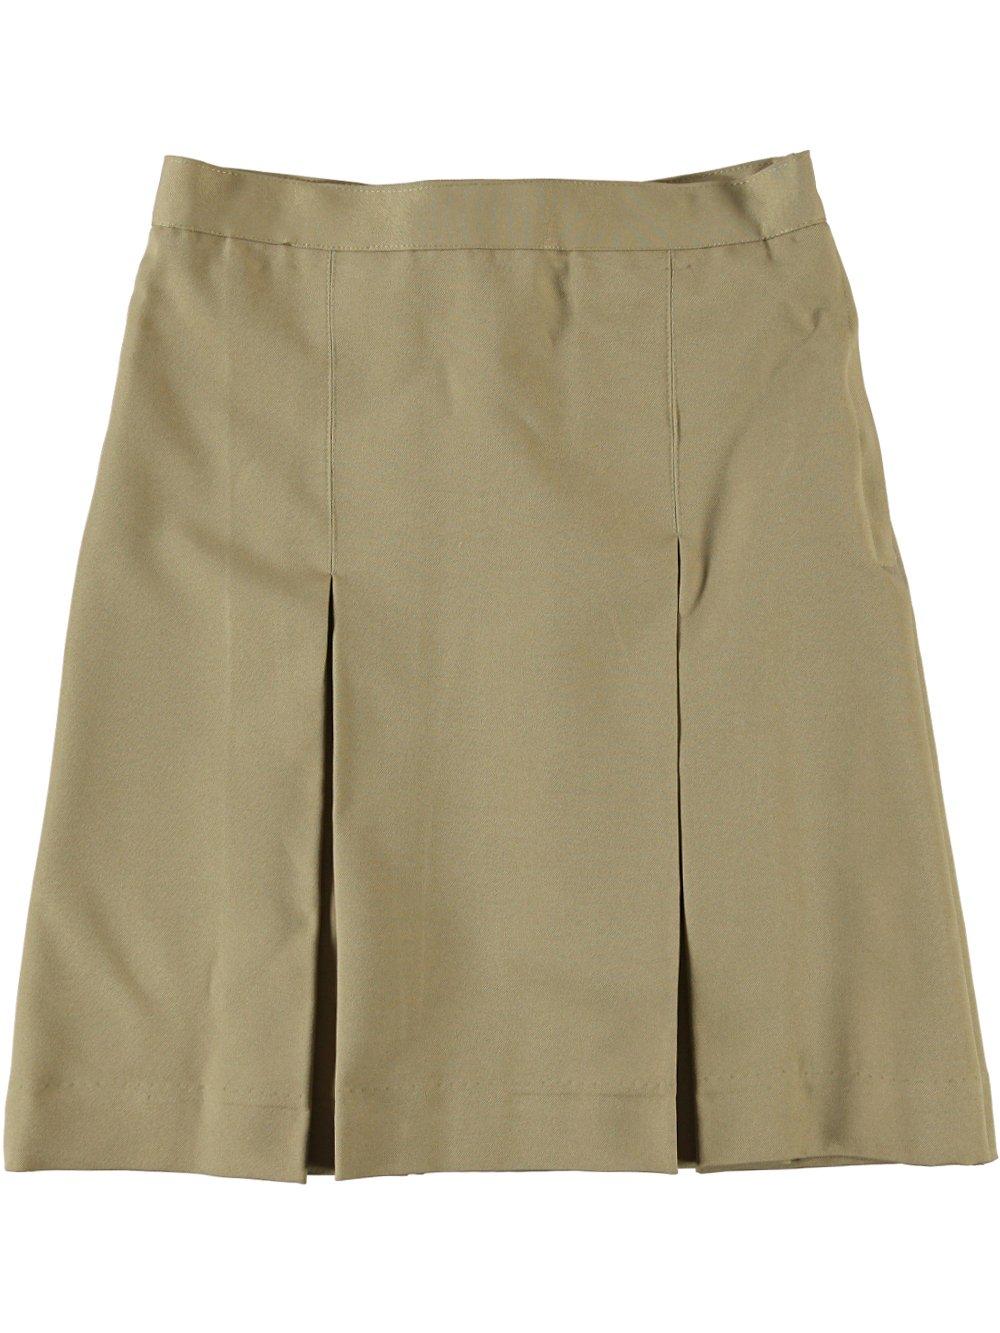 Cookie's Brand Big Girls' Box Pleat Skirt - khaki, 12